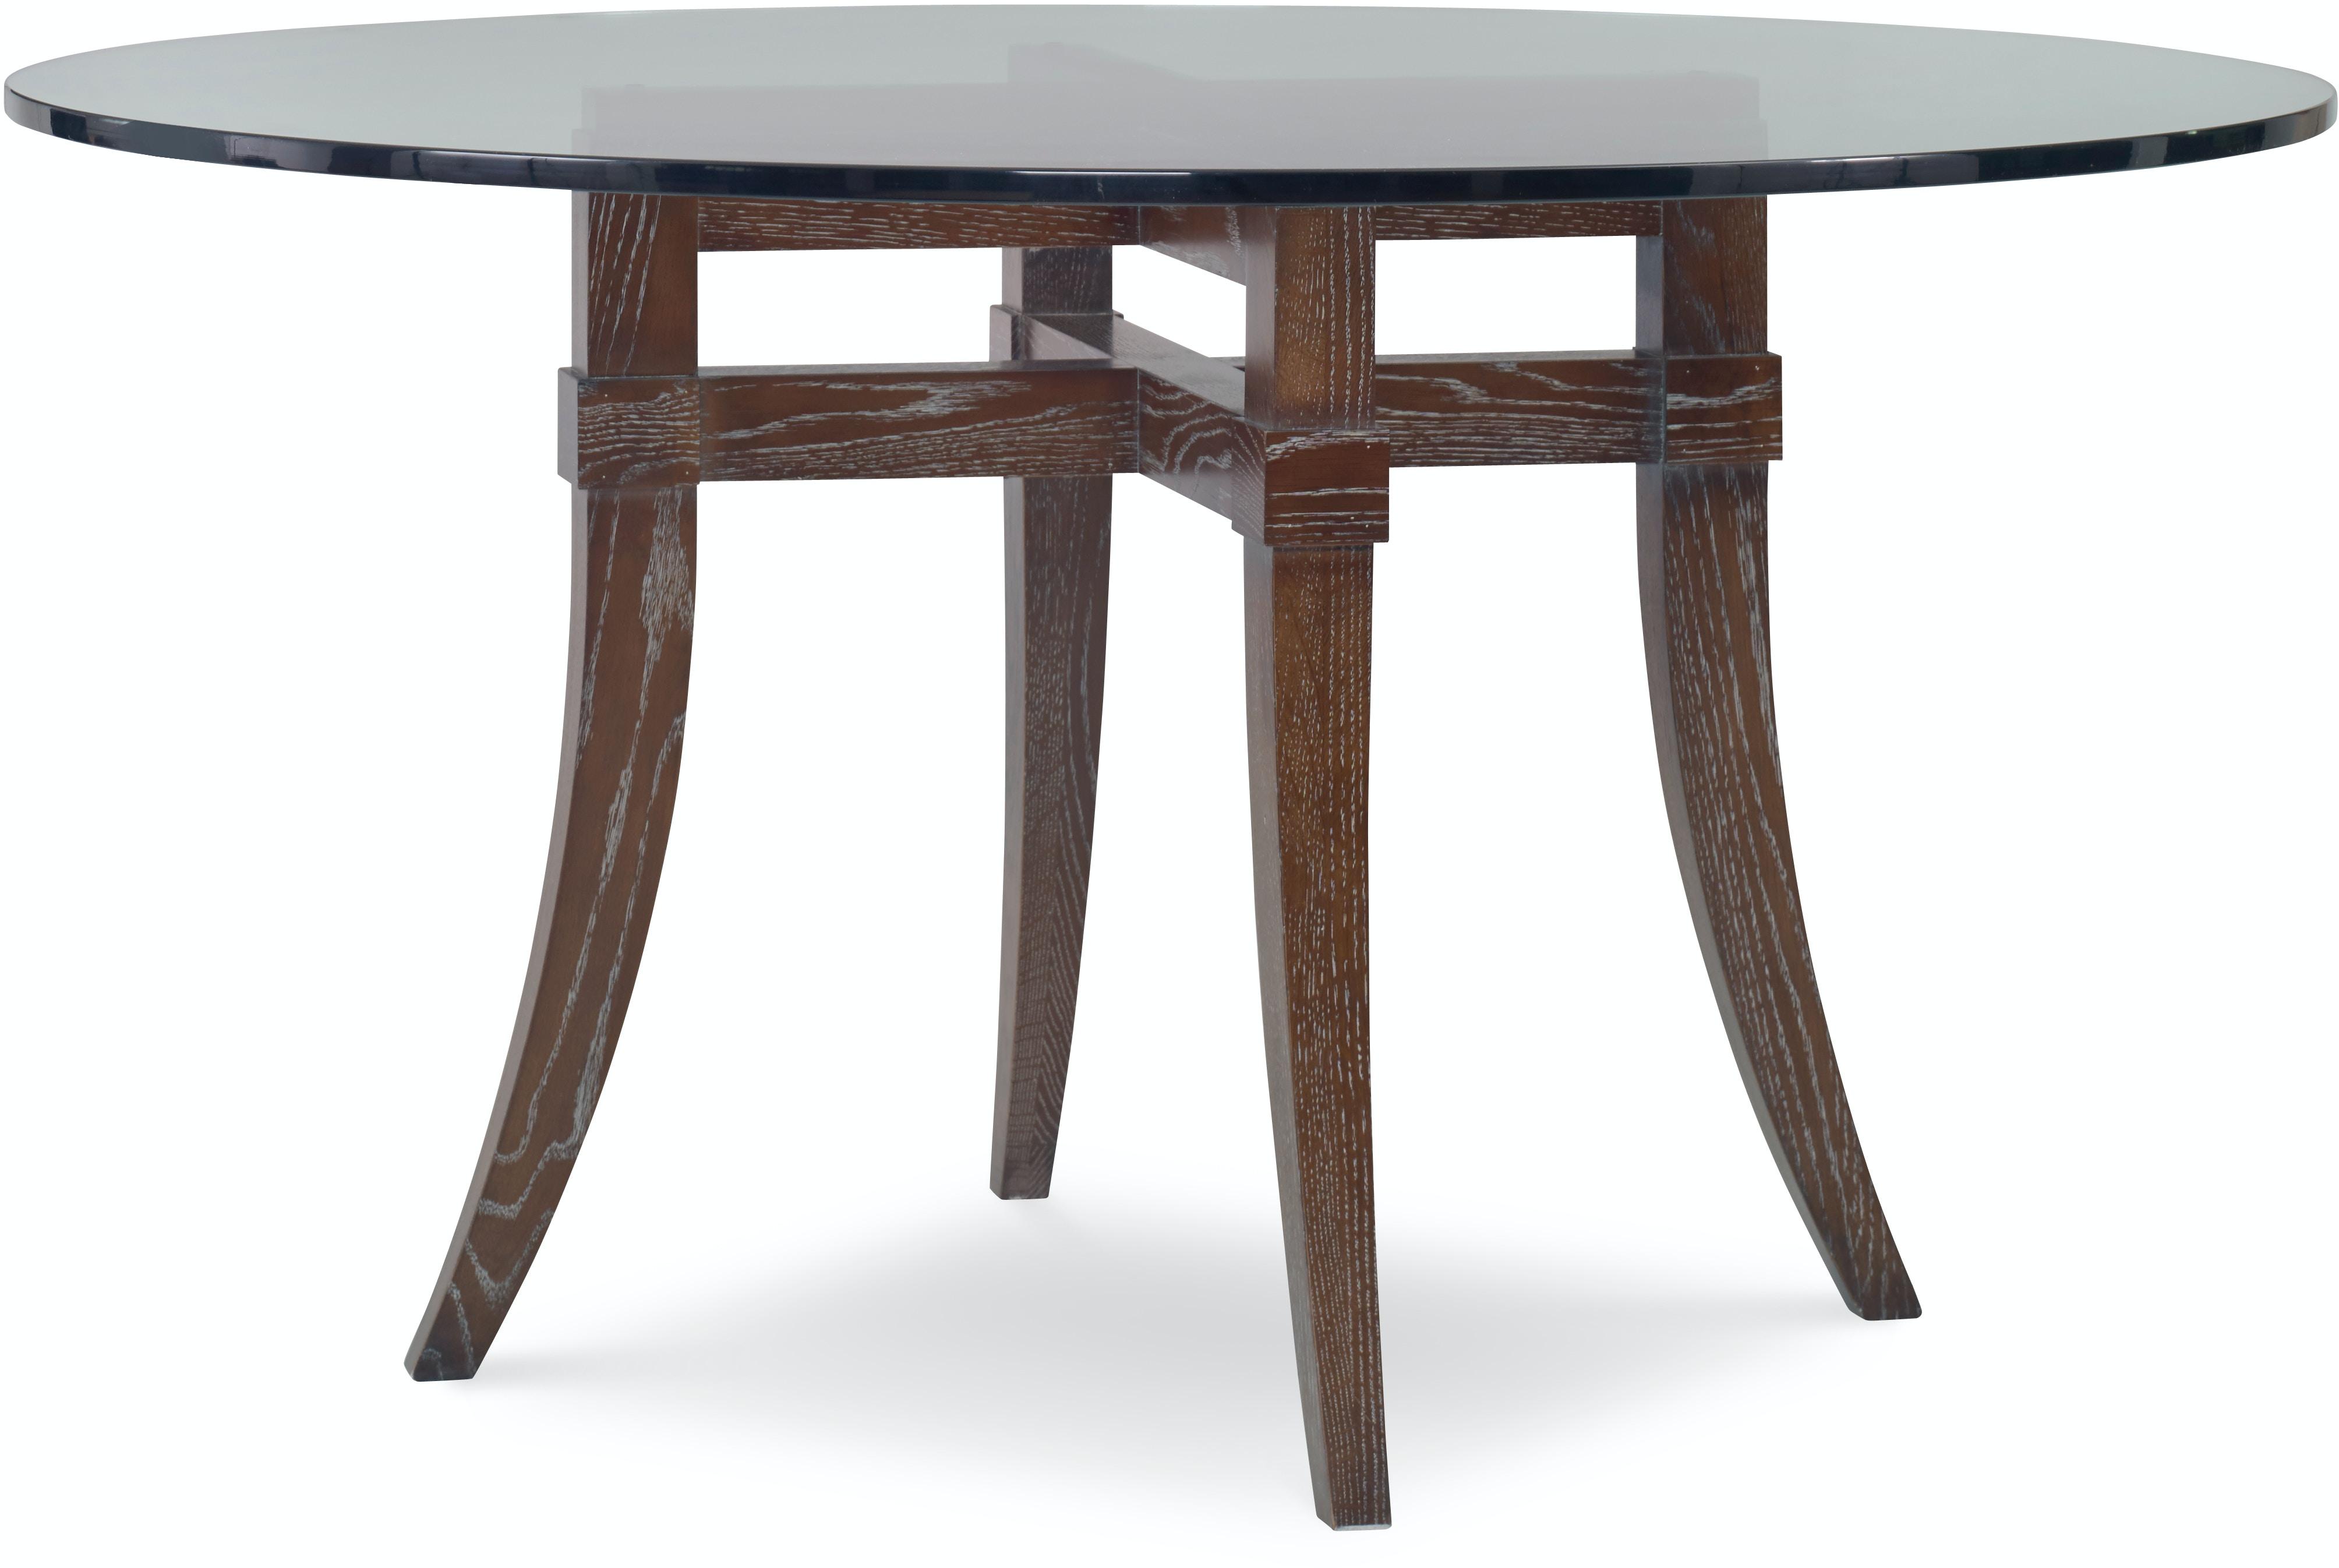 Lovely Round Dining Table Nyc Light of Dining Room : hd32 54rdg1 from lightofdiningroom.com size 4016 x 2692 jpeg 308kB